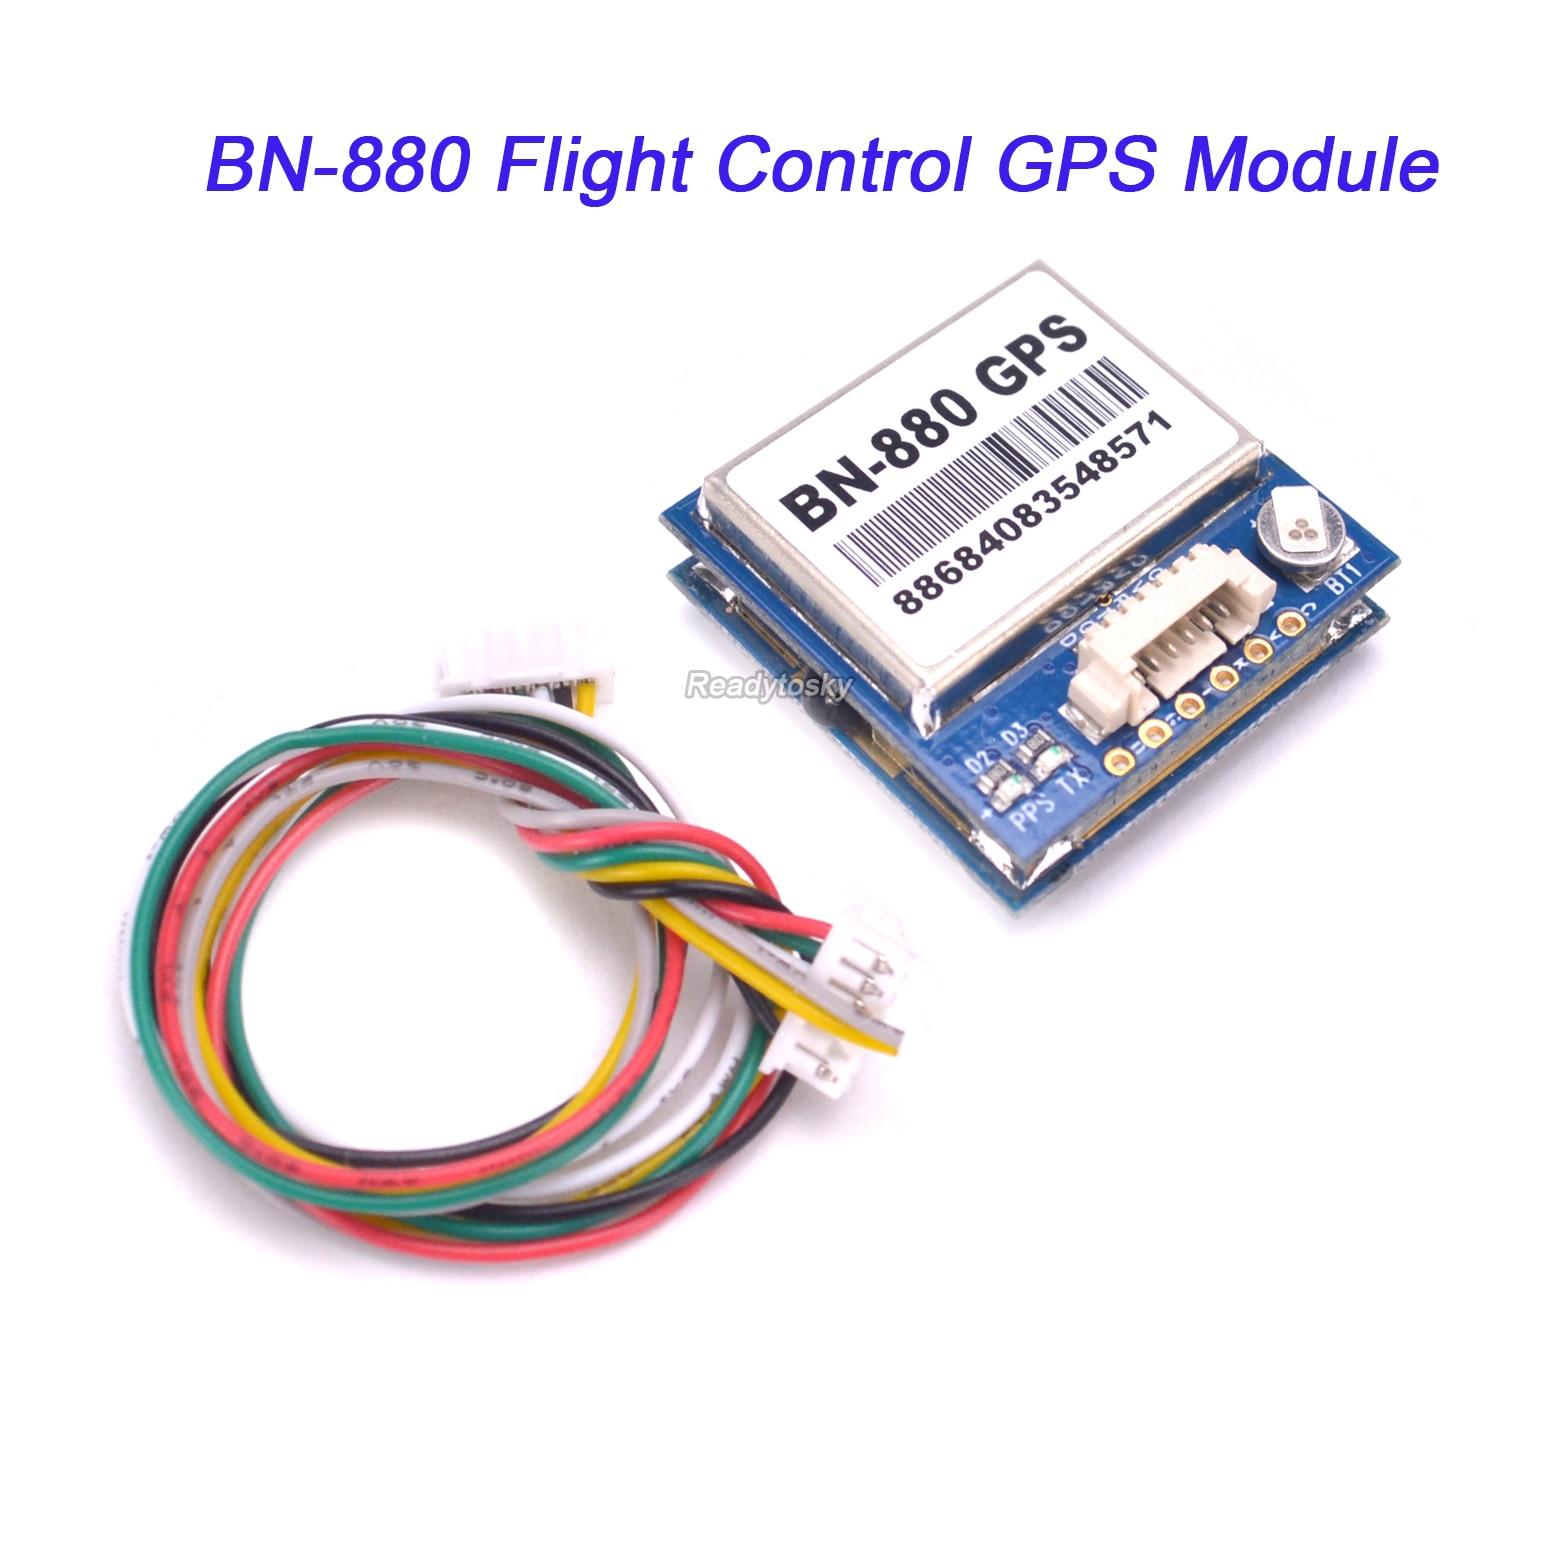 BN-880 جديد BN880 وحدة GPS التحكم في الطيران وحدة مزدوجة البوصلة مع كابل ل APM 2.6 APM2.8 / Pixhawk 2.4.7 PIXHAWK 2.4.8